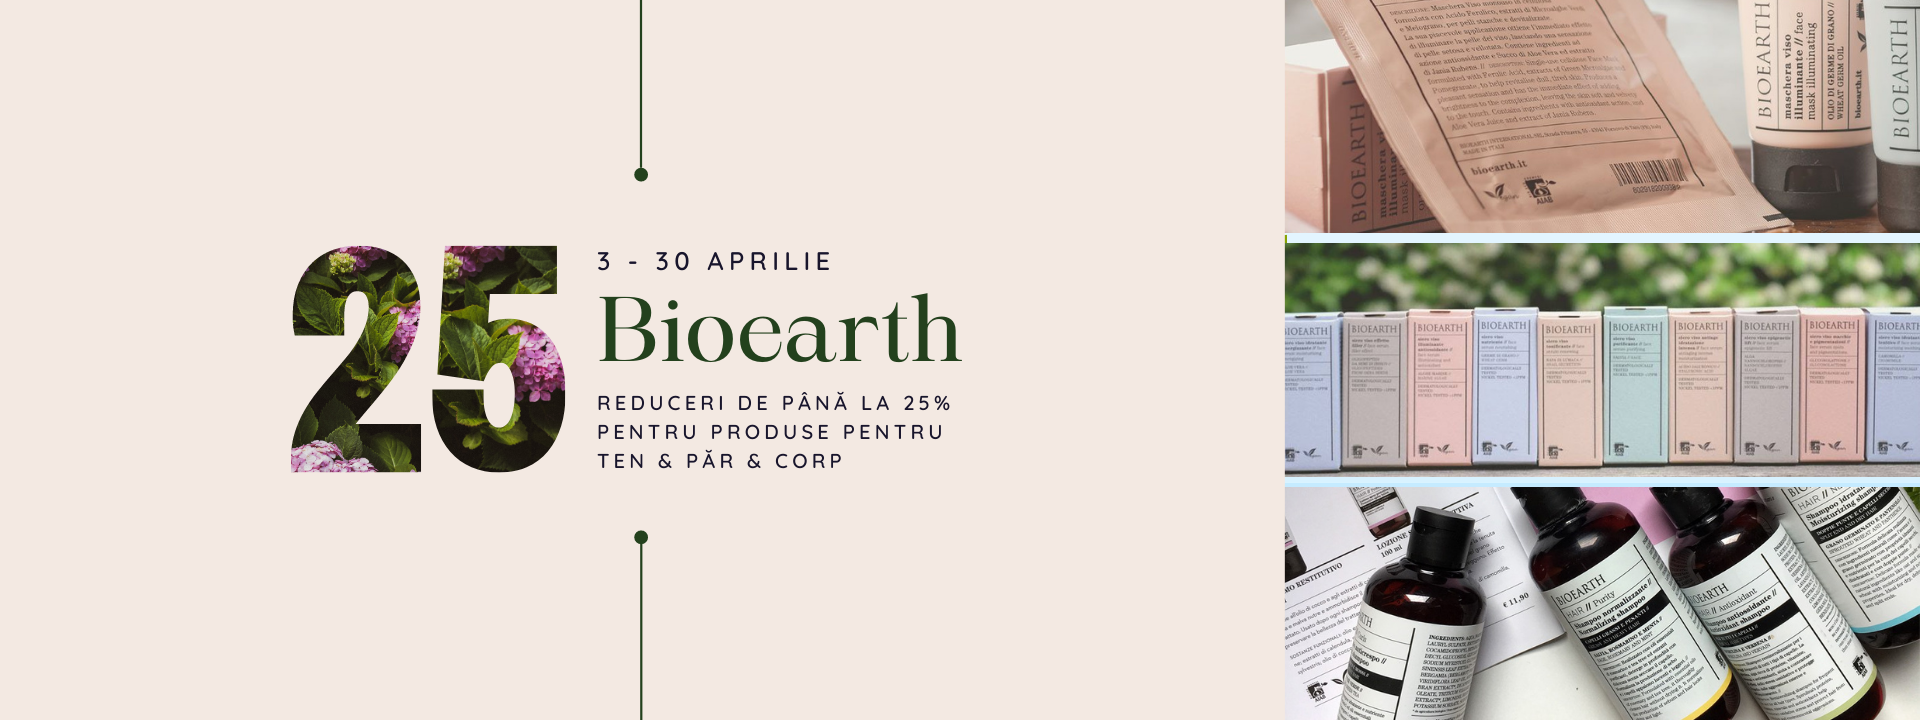 Bioearth sale